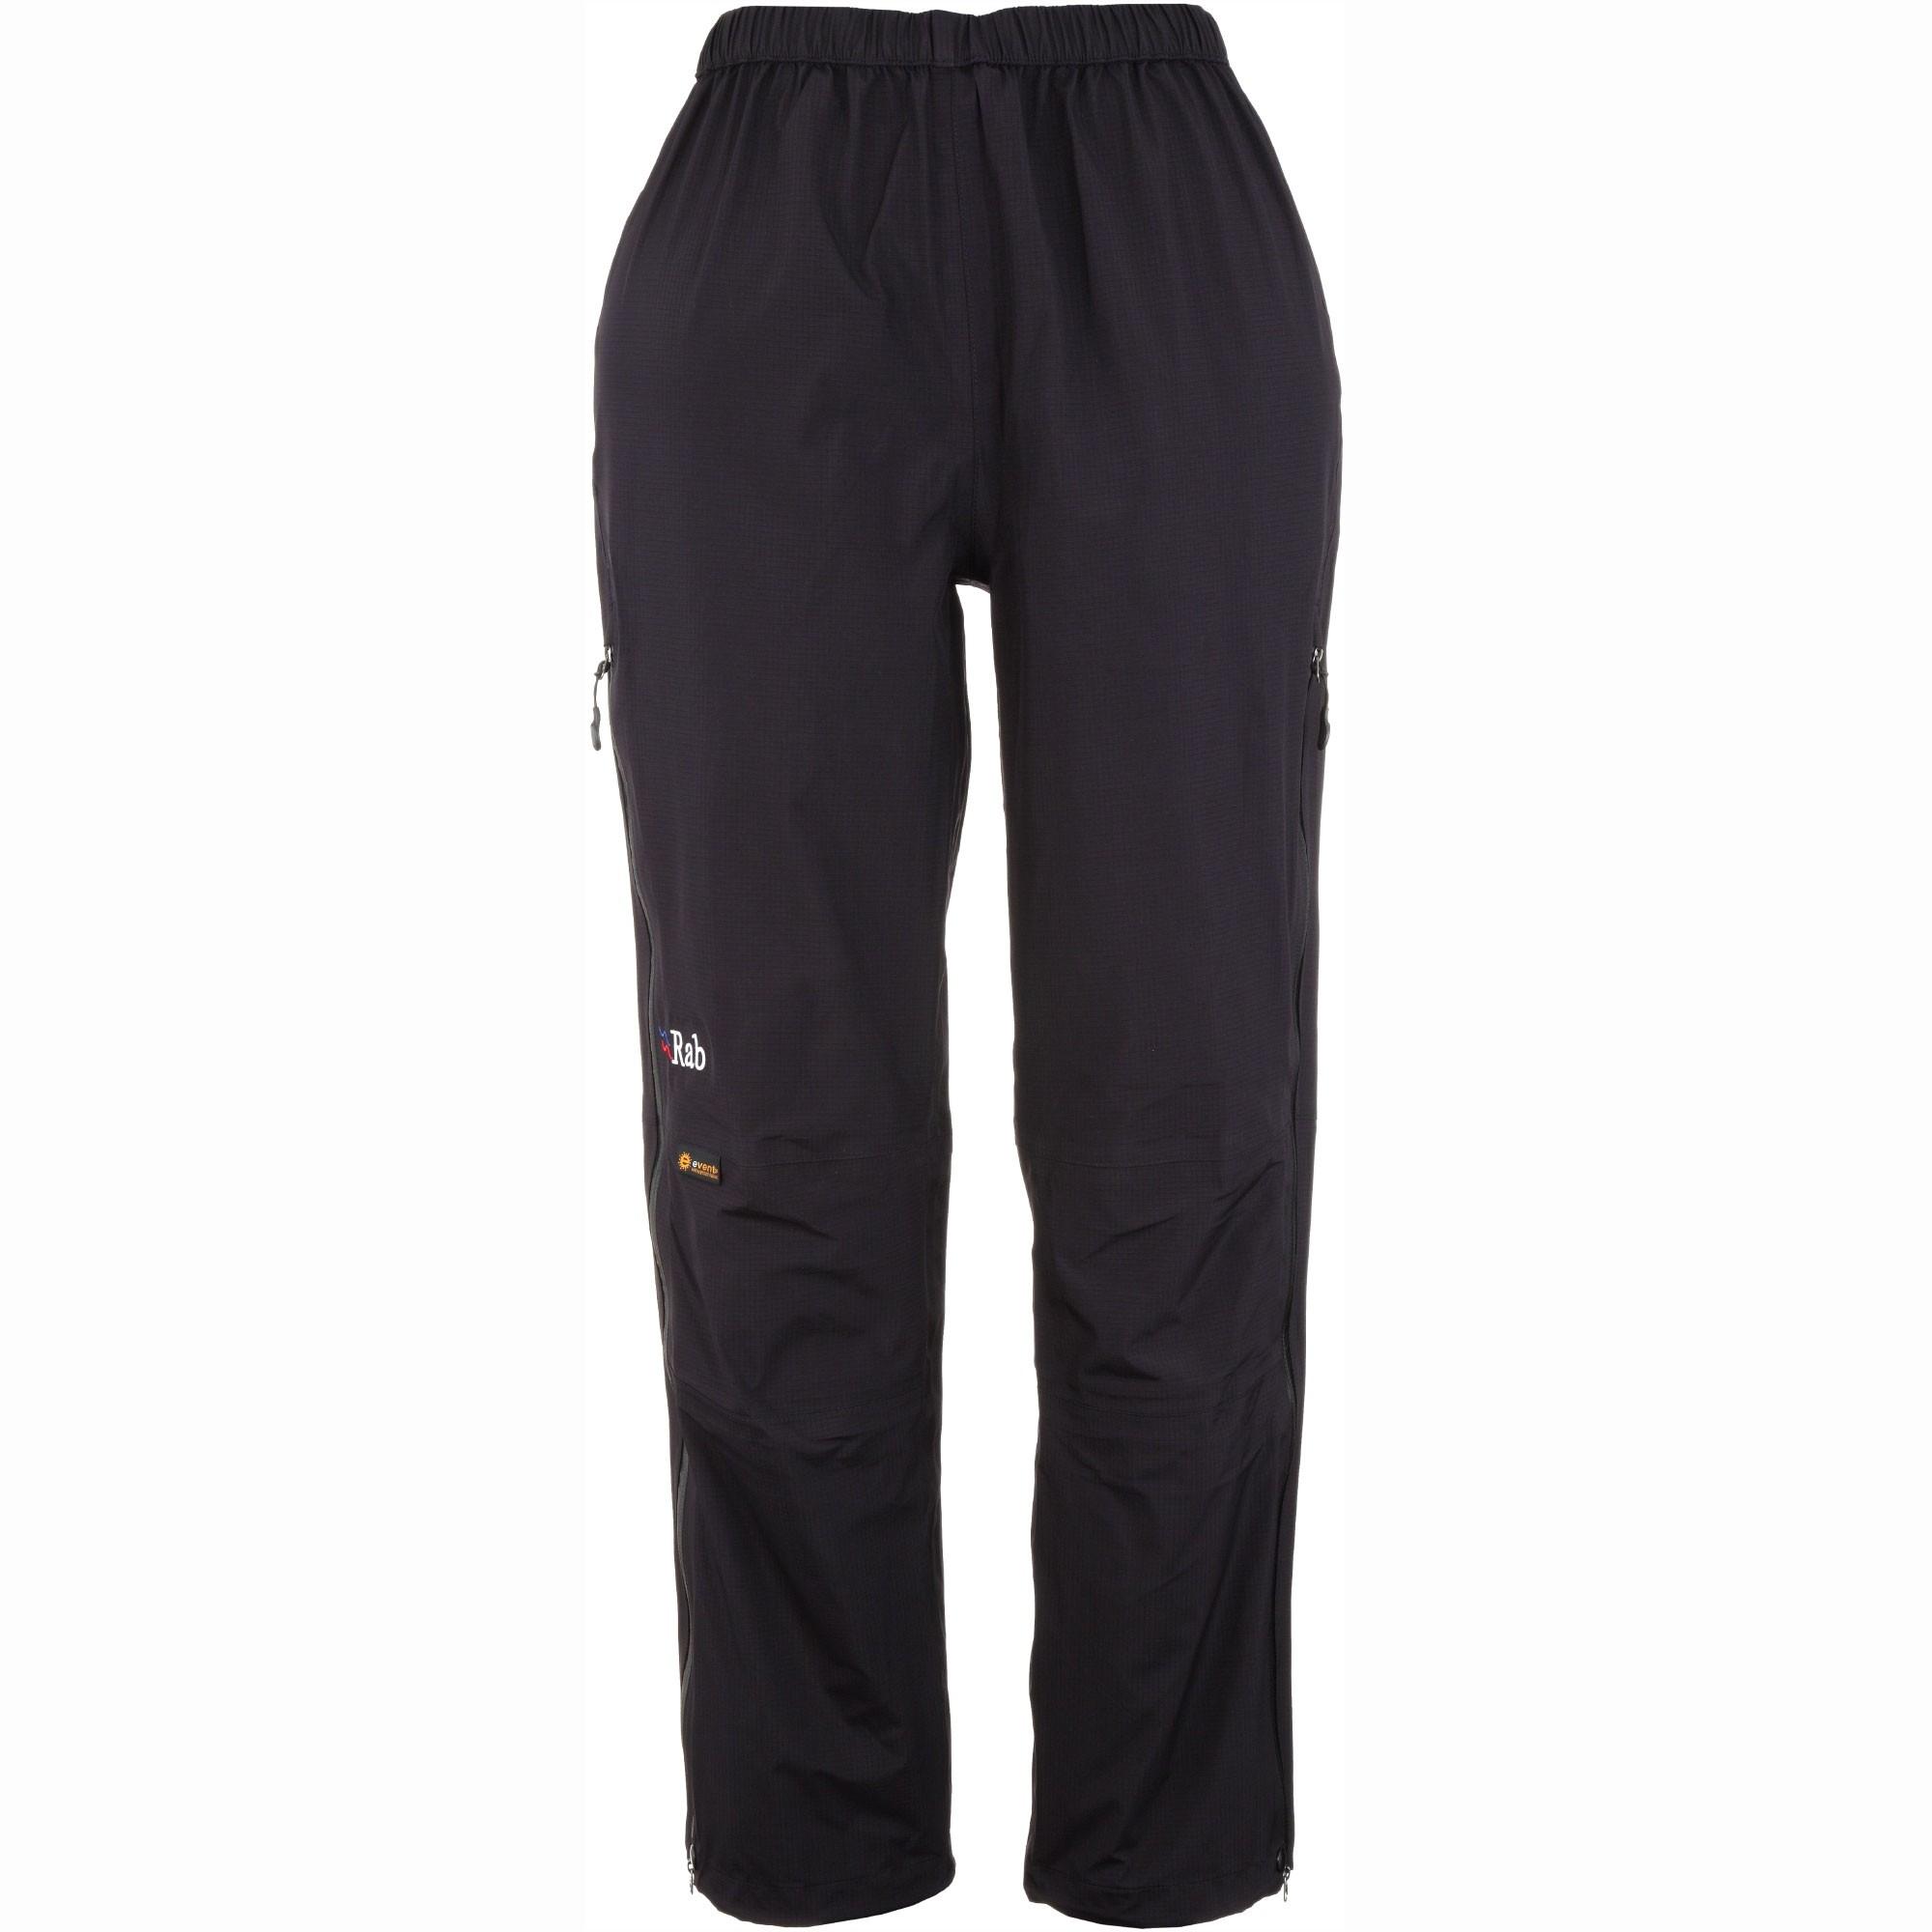 Rab Vidda Women's Waterproof Over-Trousers - Black